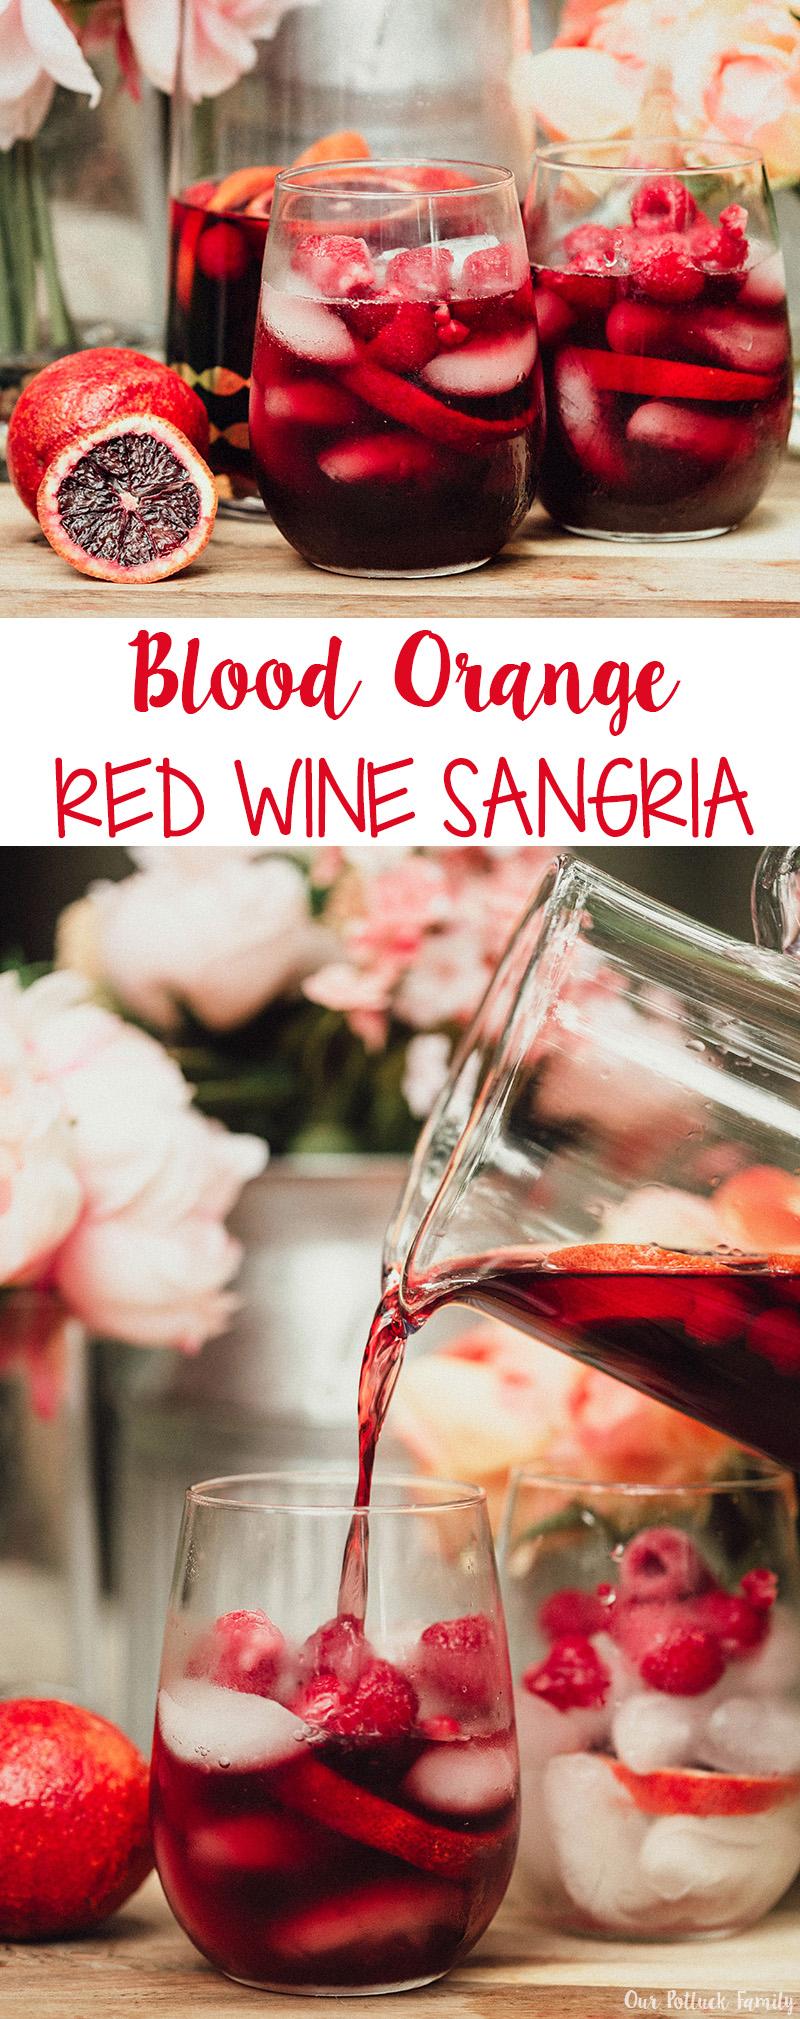 Blood Orange Red Wine Sangria